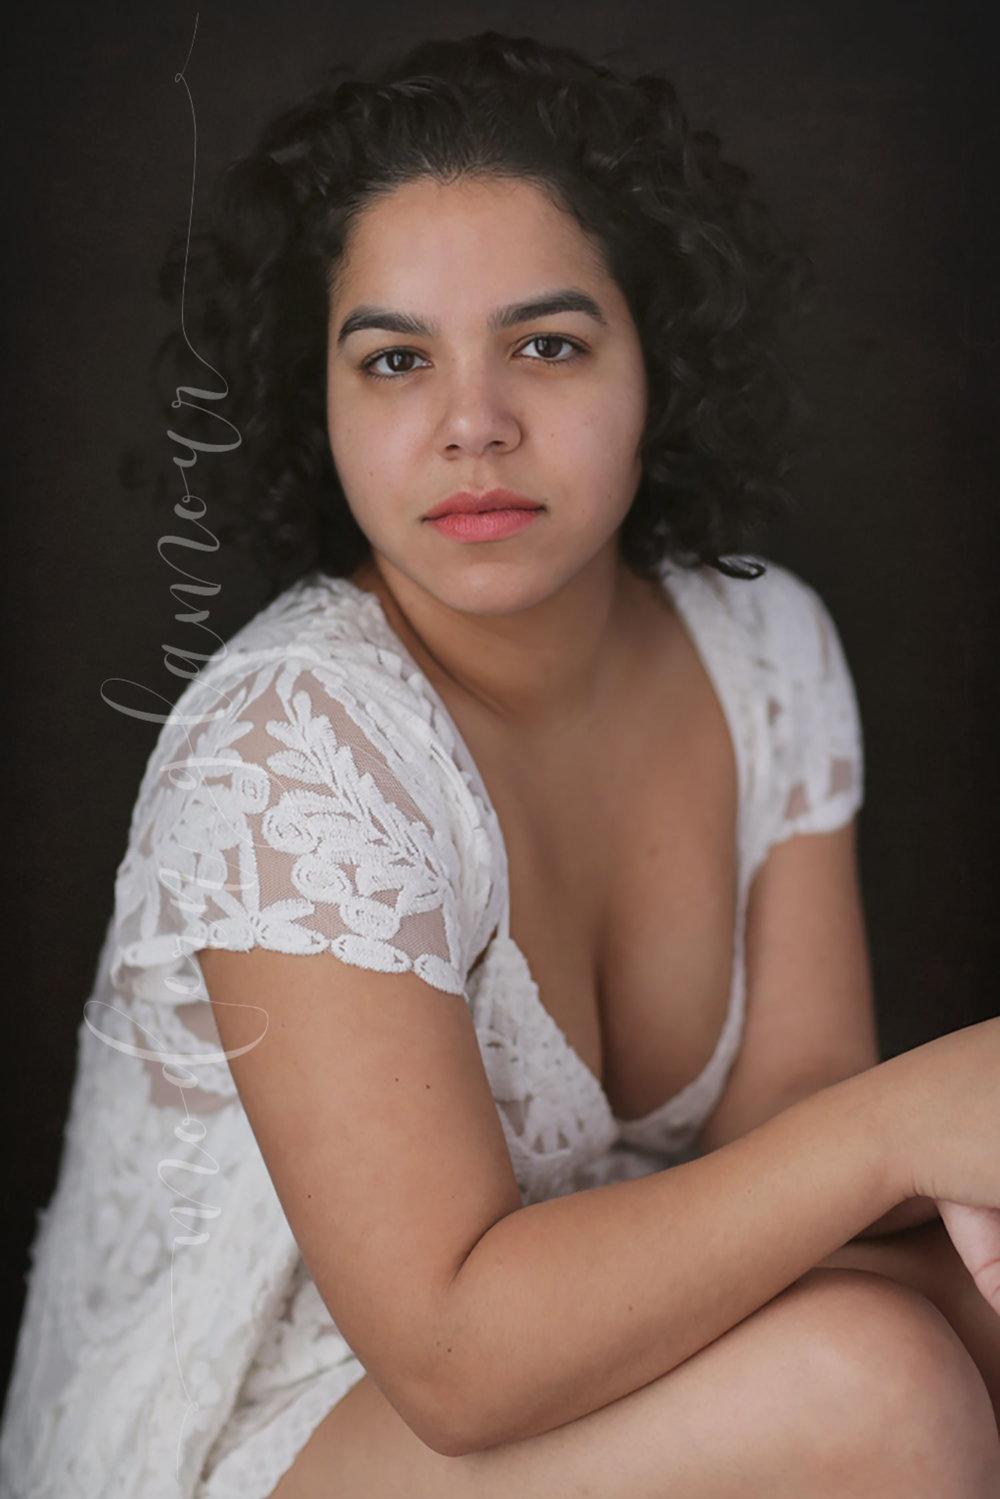 boudoir photos boston curly hair no make up